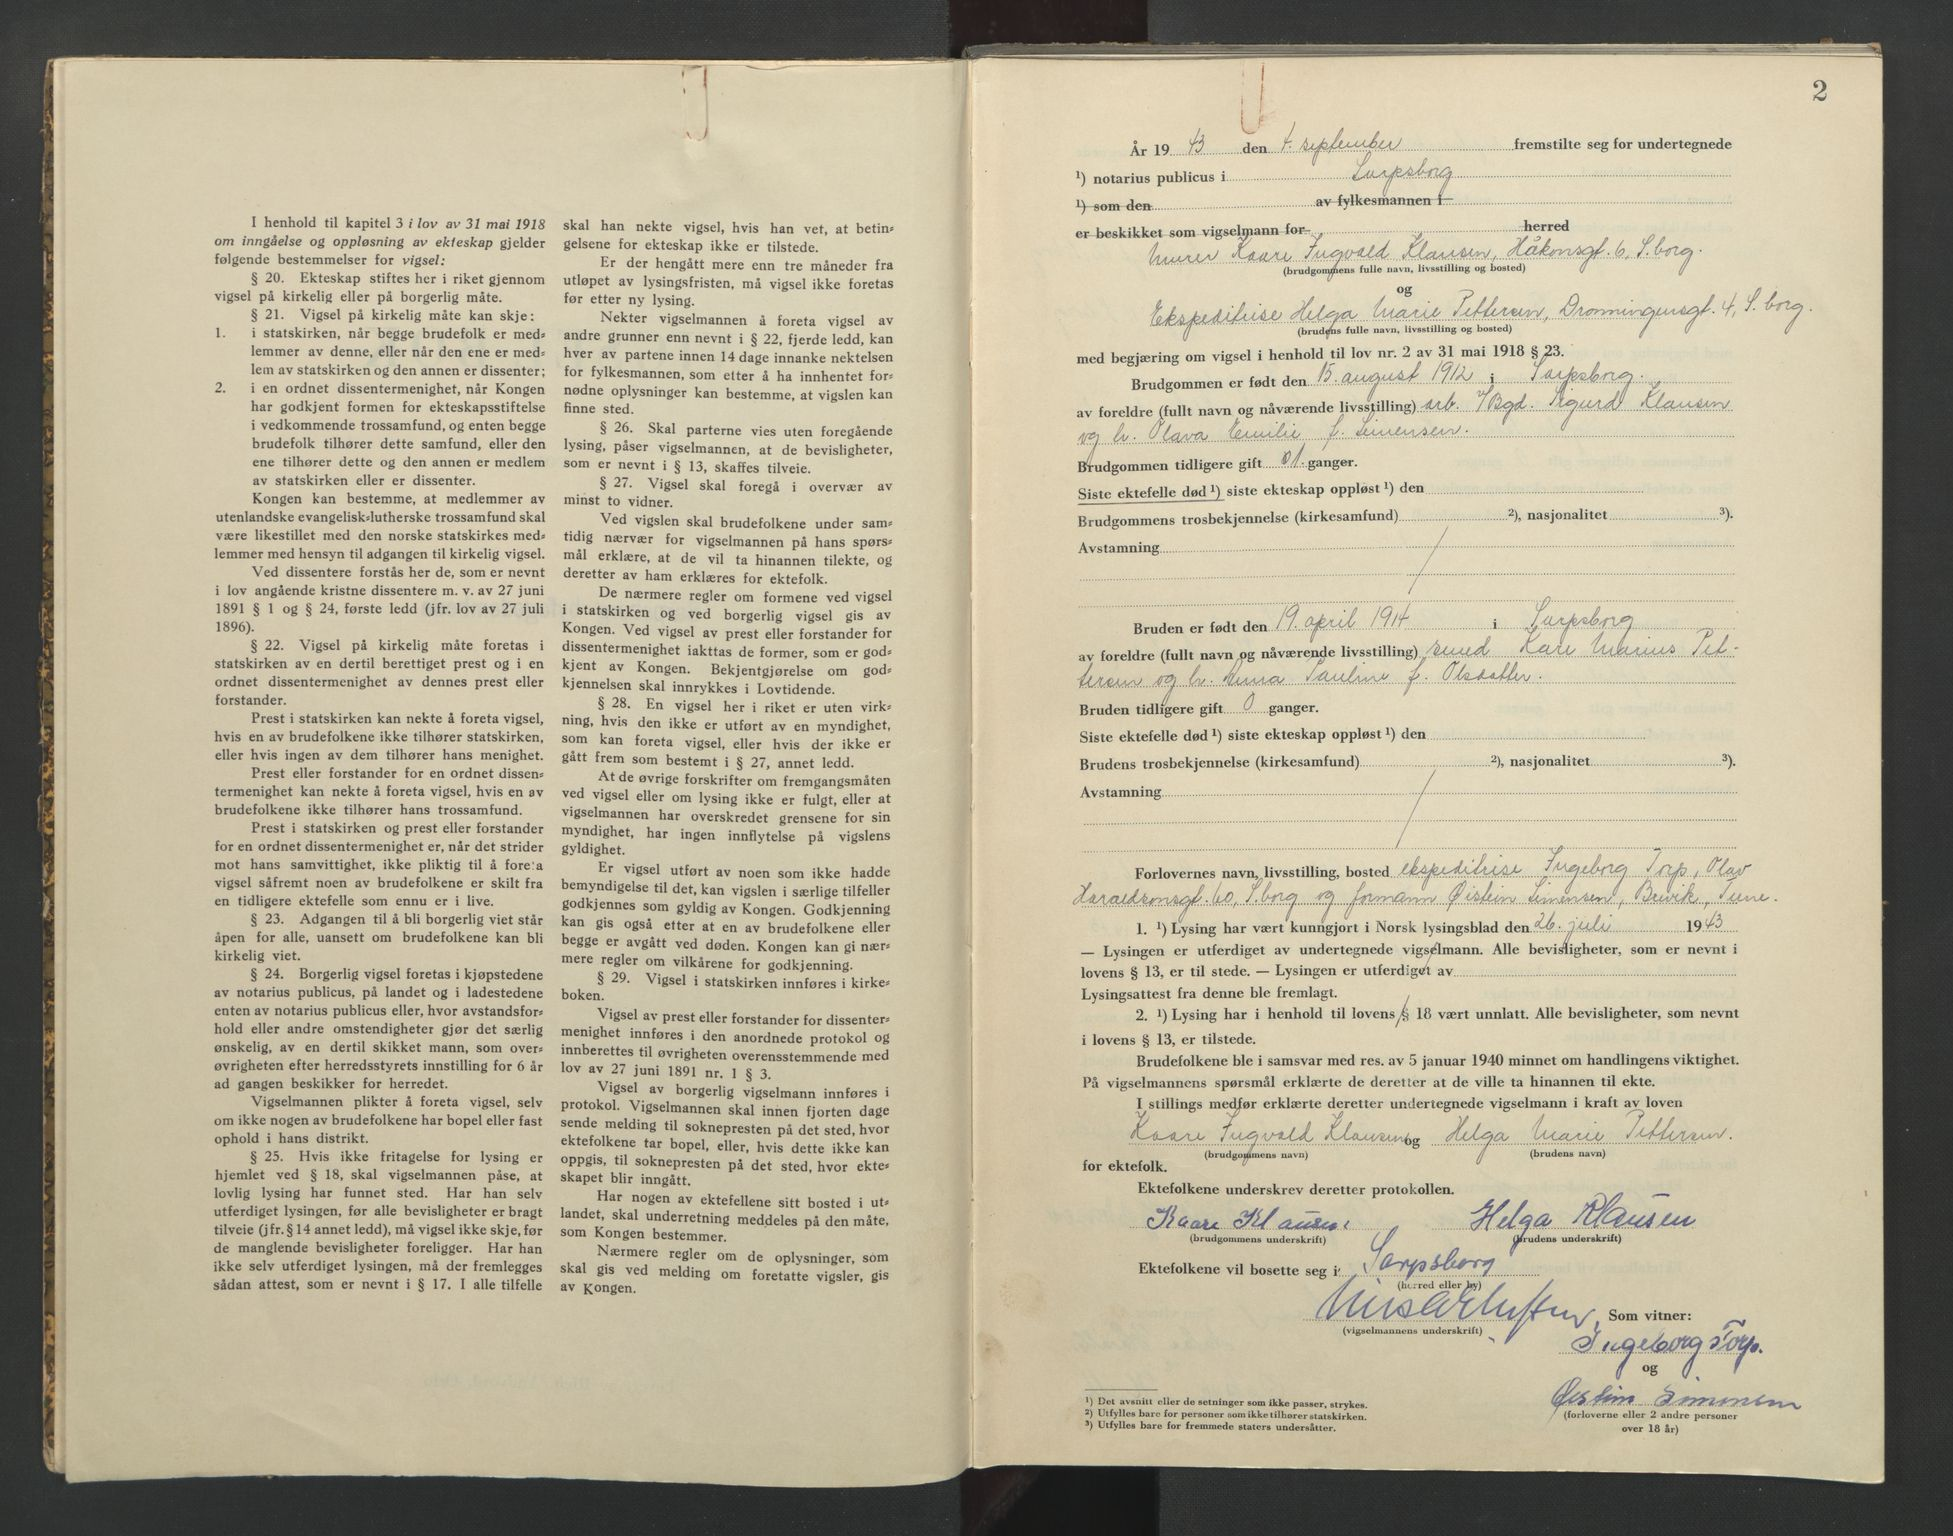 SAO, Sarpsborg byfogd, L/Lb/Lba/L0003: Vigselbok, 1943-1945, s. 2